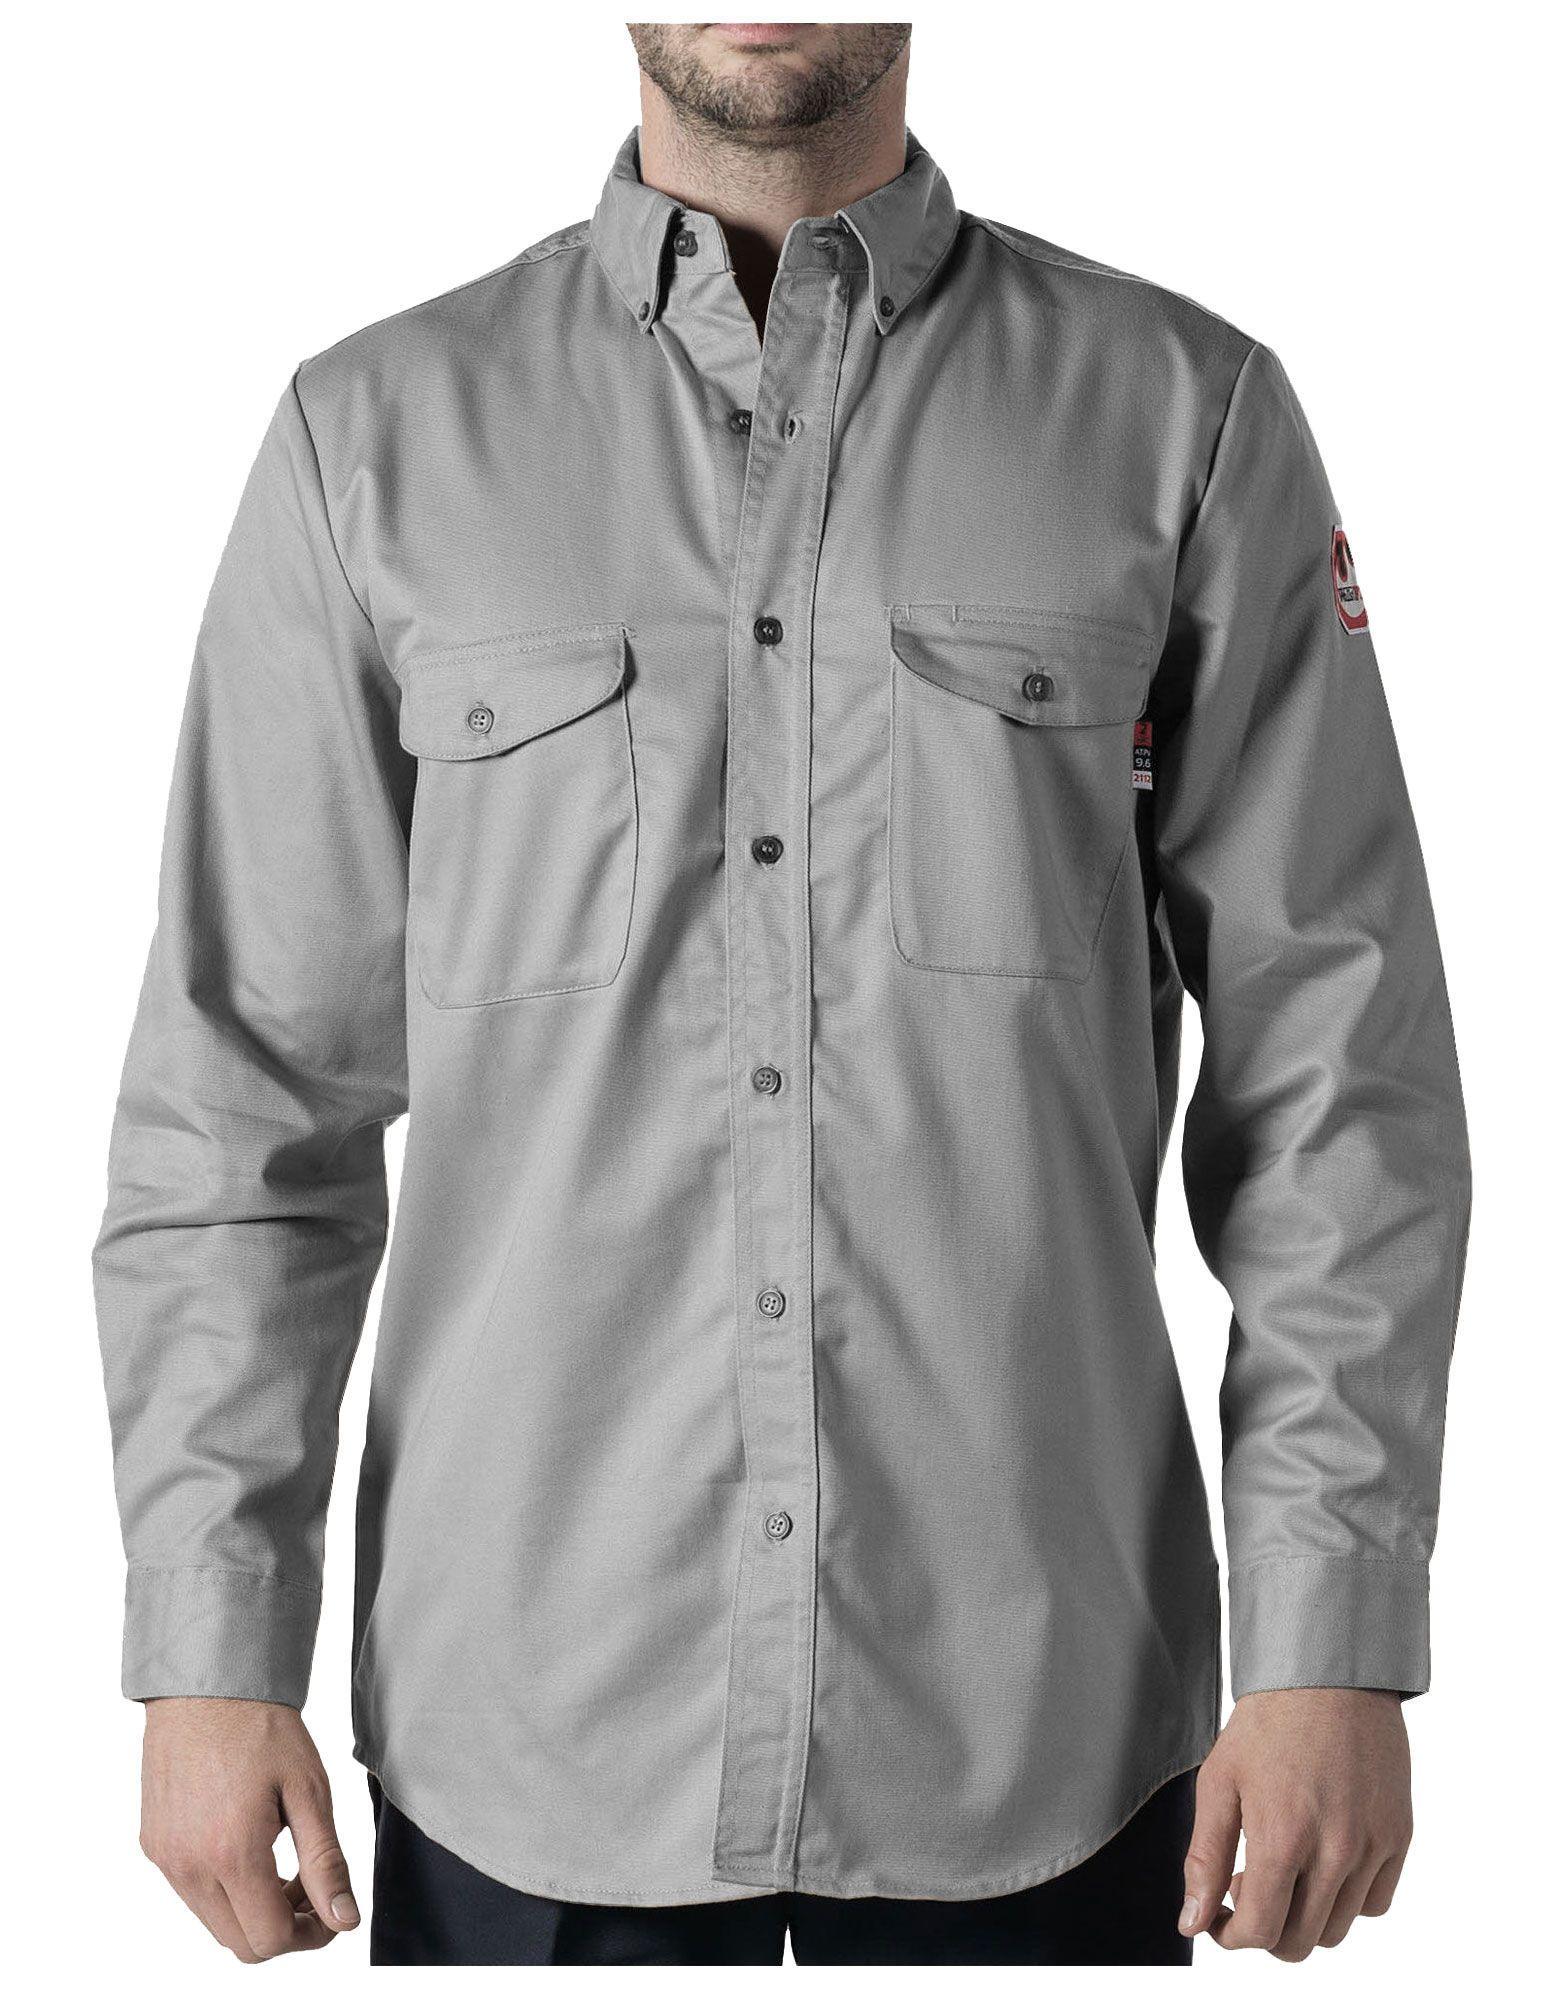 Walls - FR High End Shirt